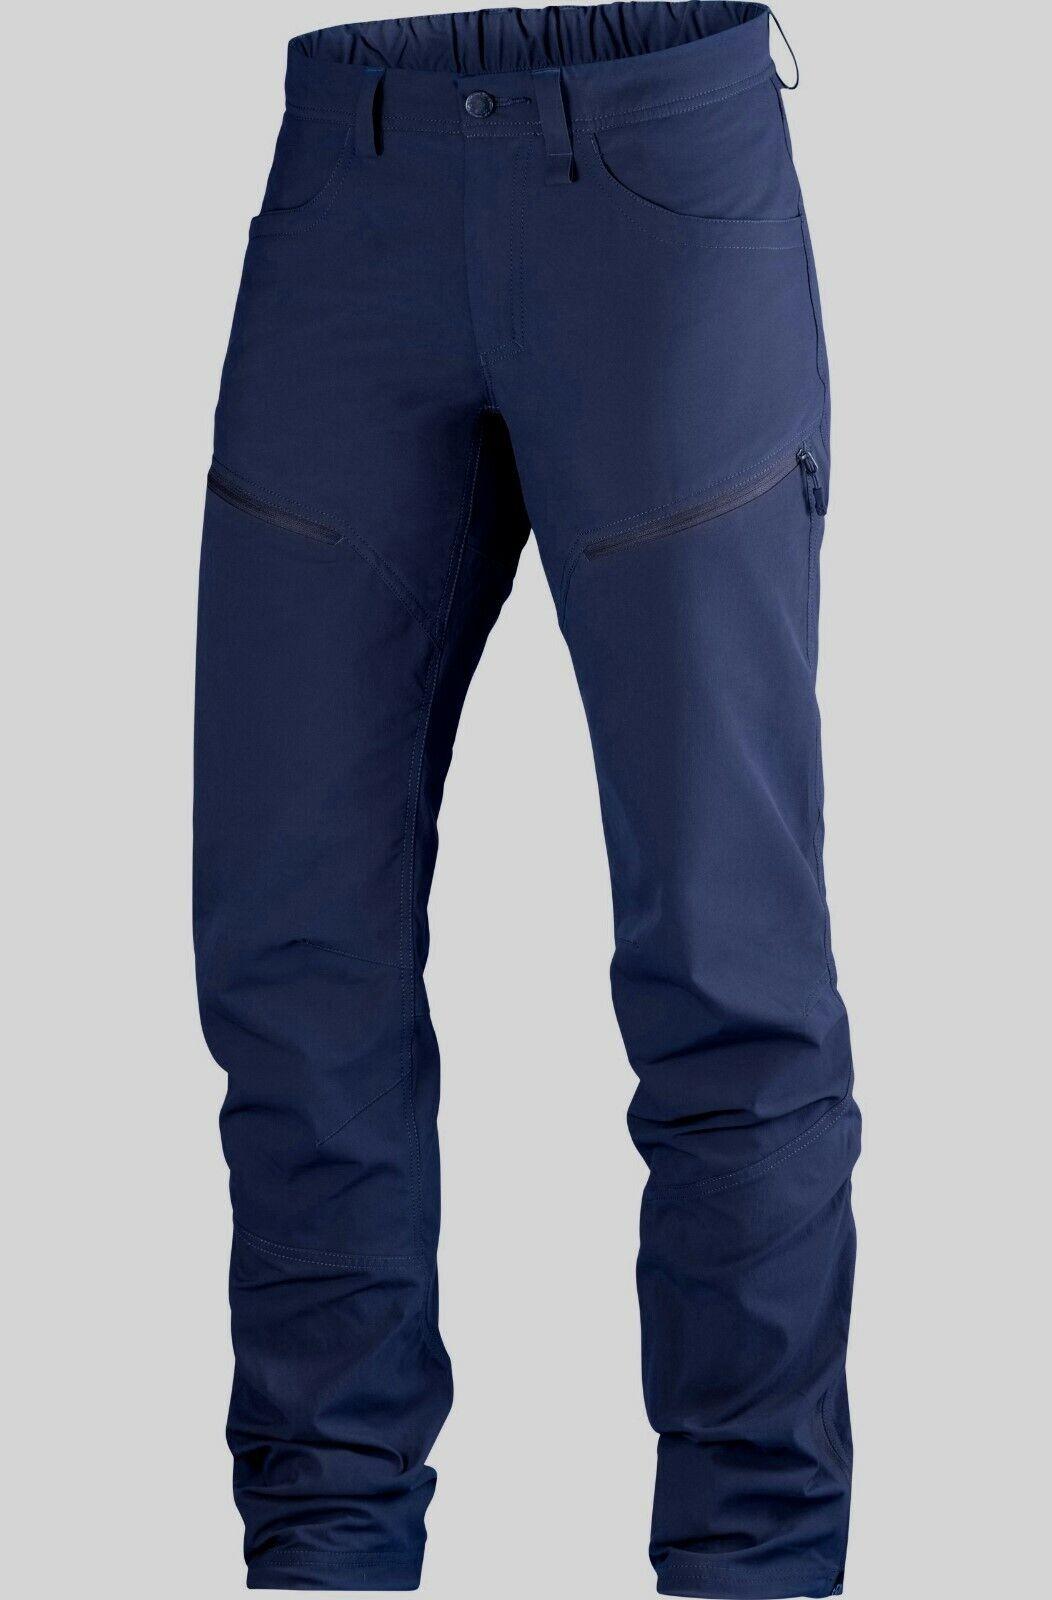 Haglöfs mid Flex Pant Men Hiking Trousers Outdoor Trousers for Men Camo bluee